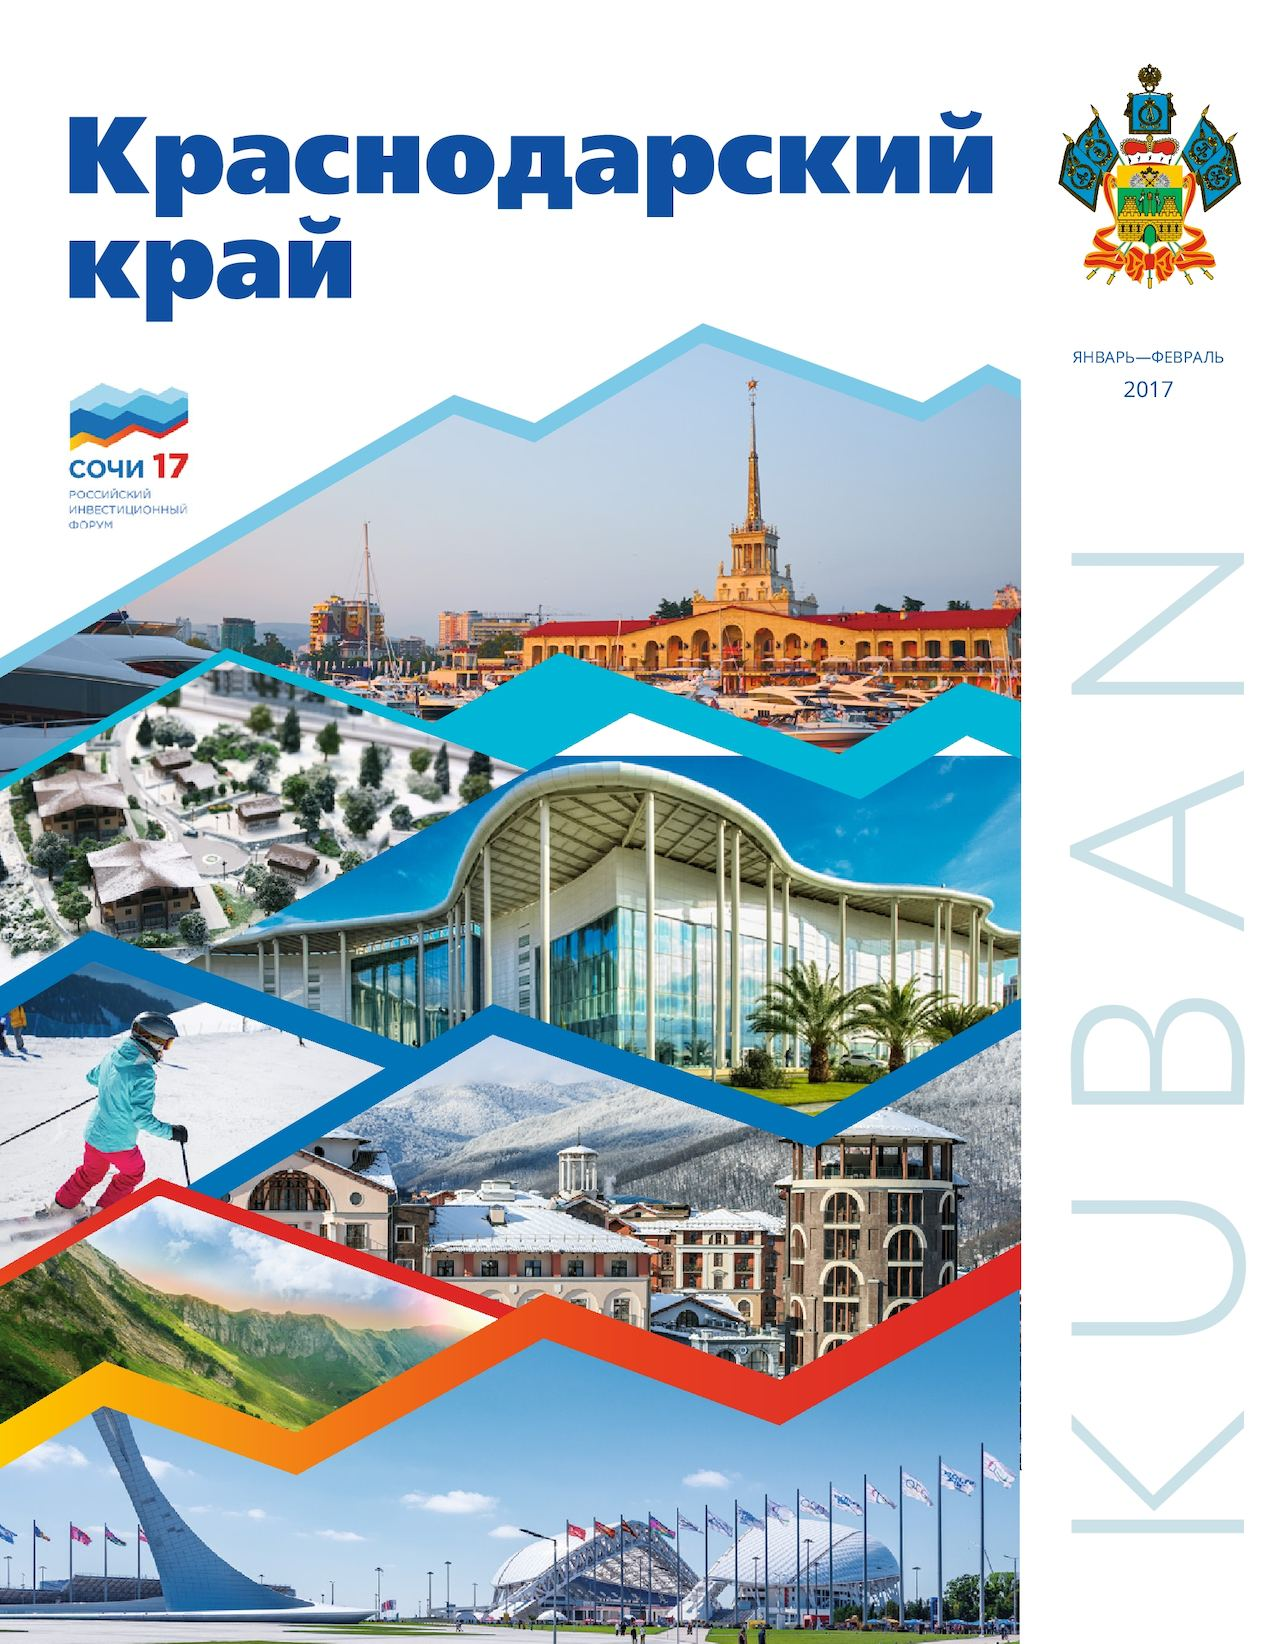 Governor of Krasnodar Region recommends upgrading Anapa hotels 92